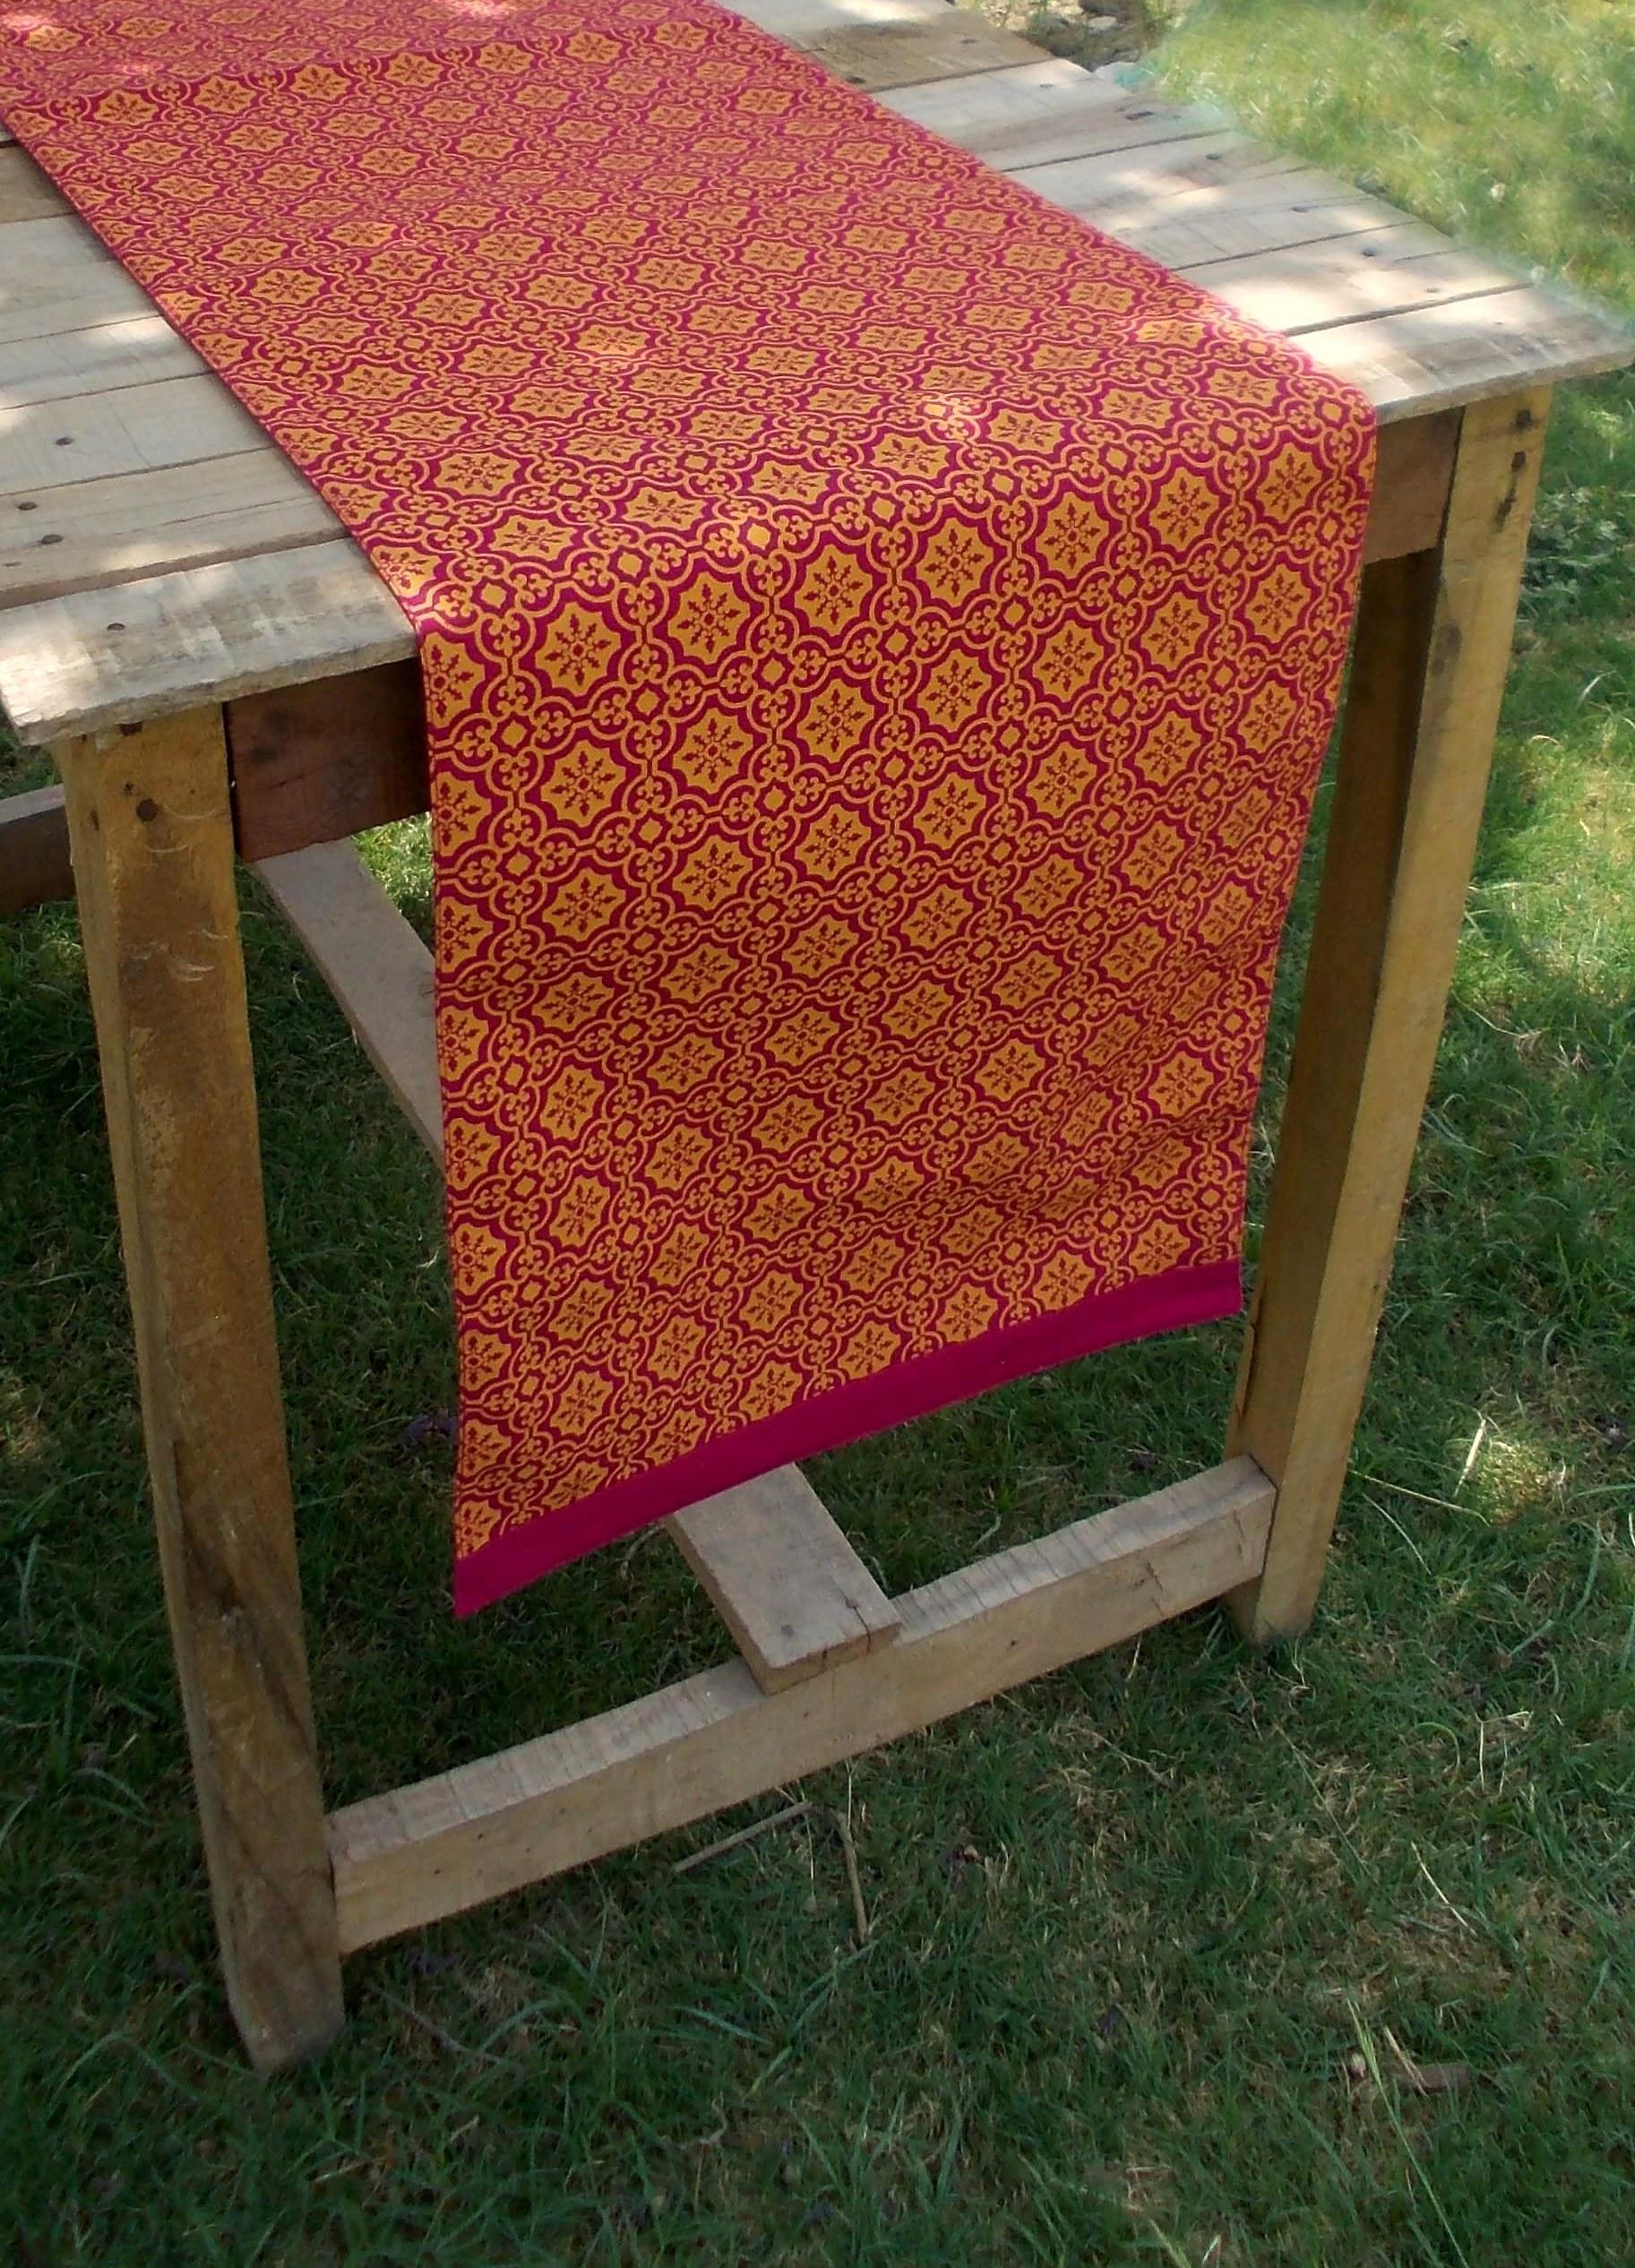 Pink and orange- Tile print Table runner